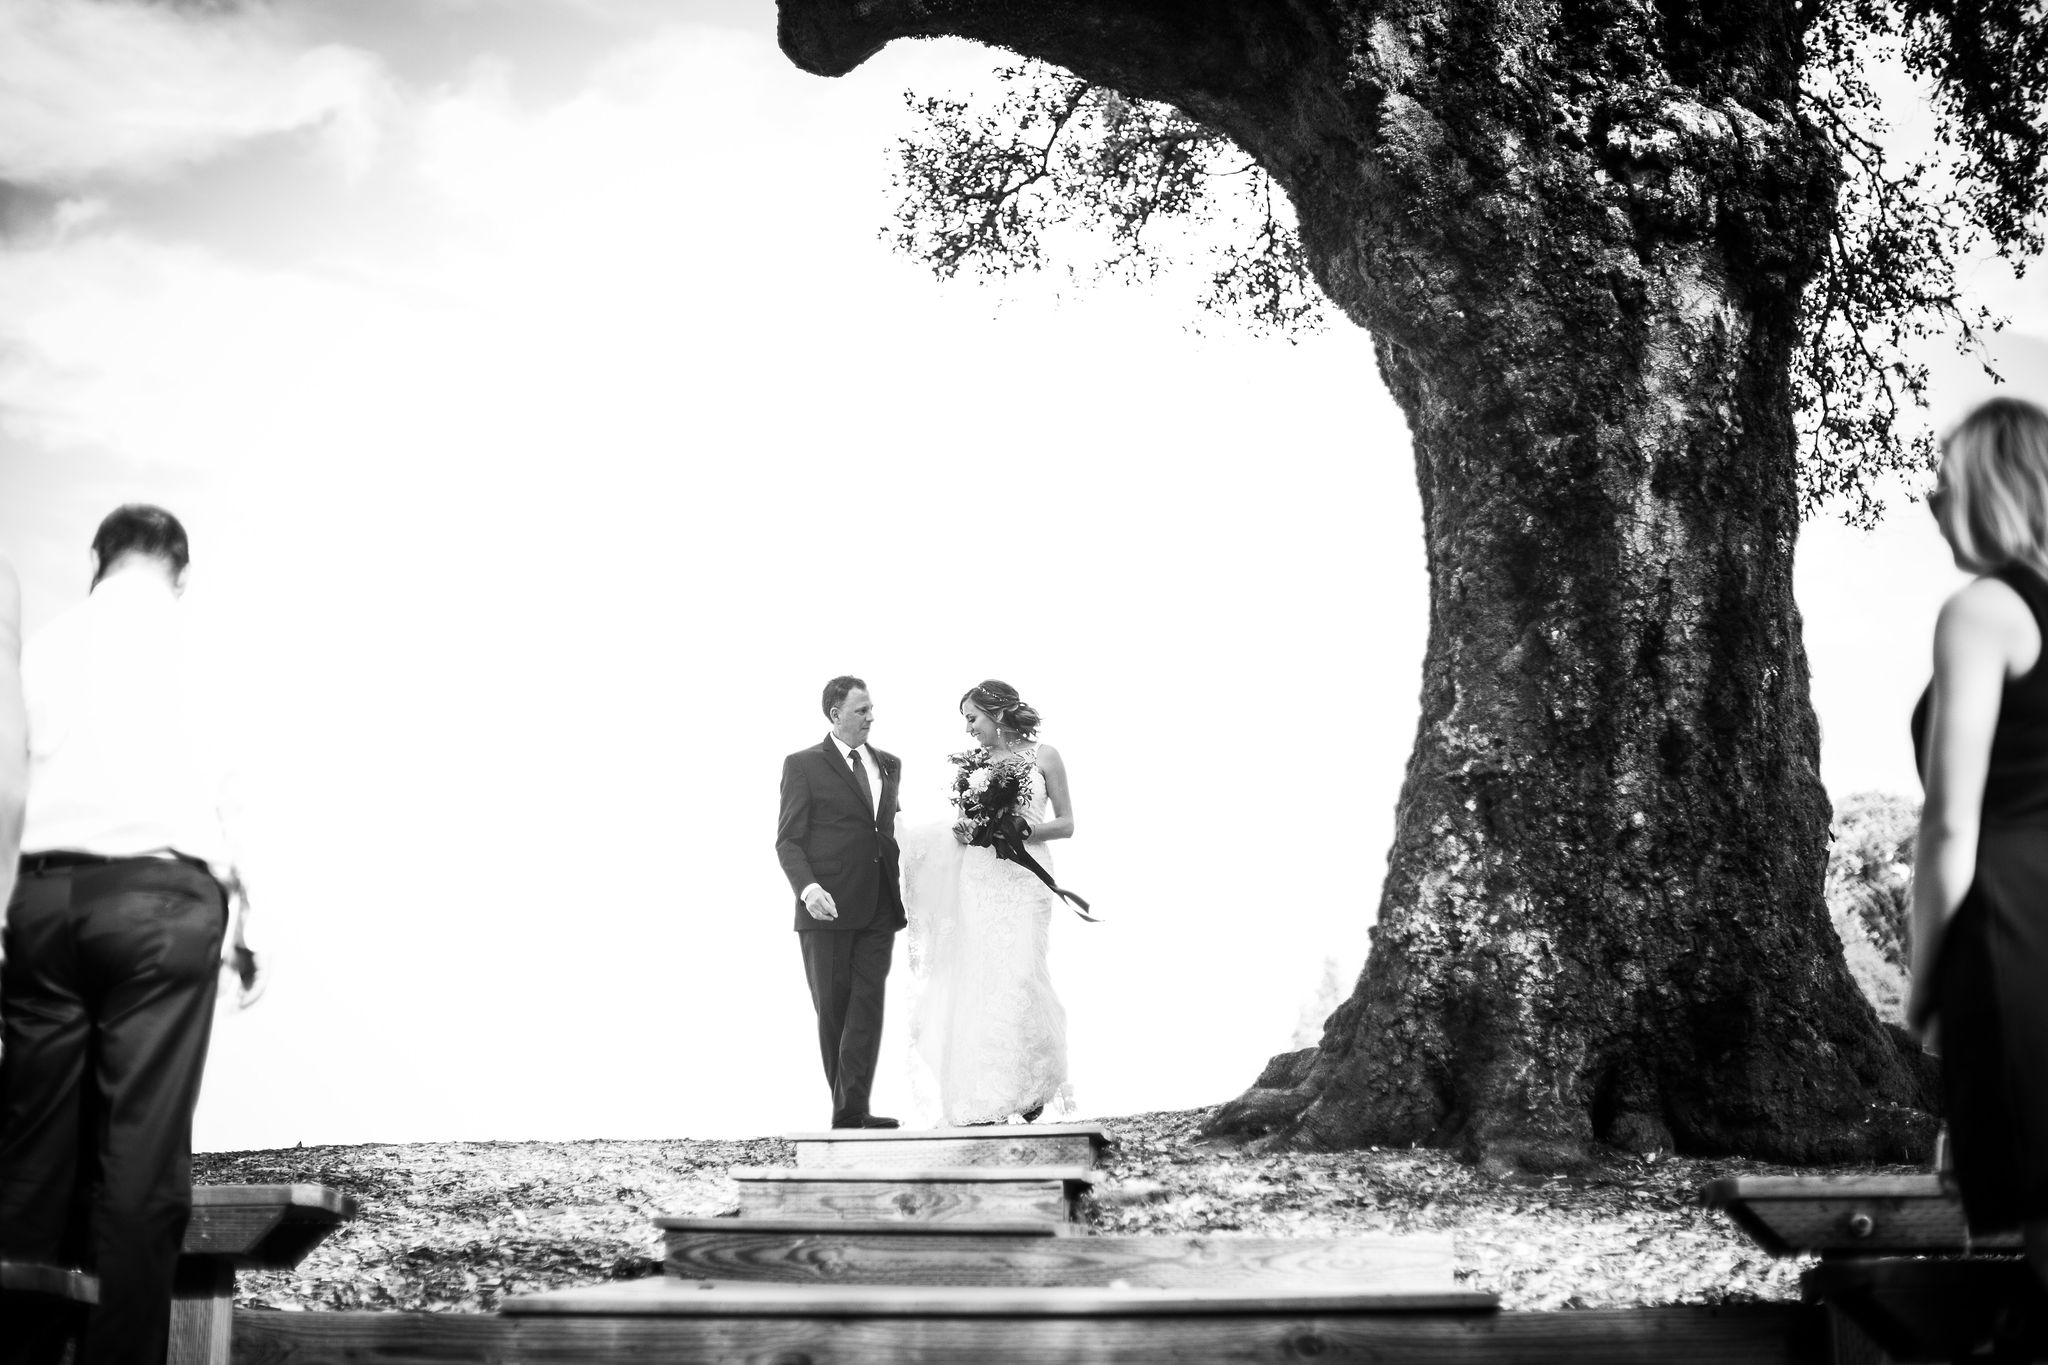 bride-walking-down-aisle-wedding